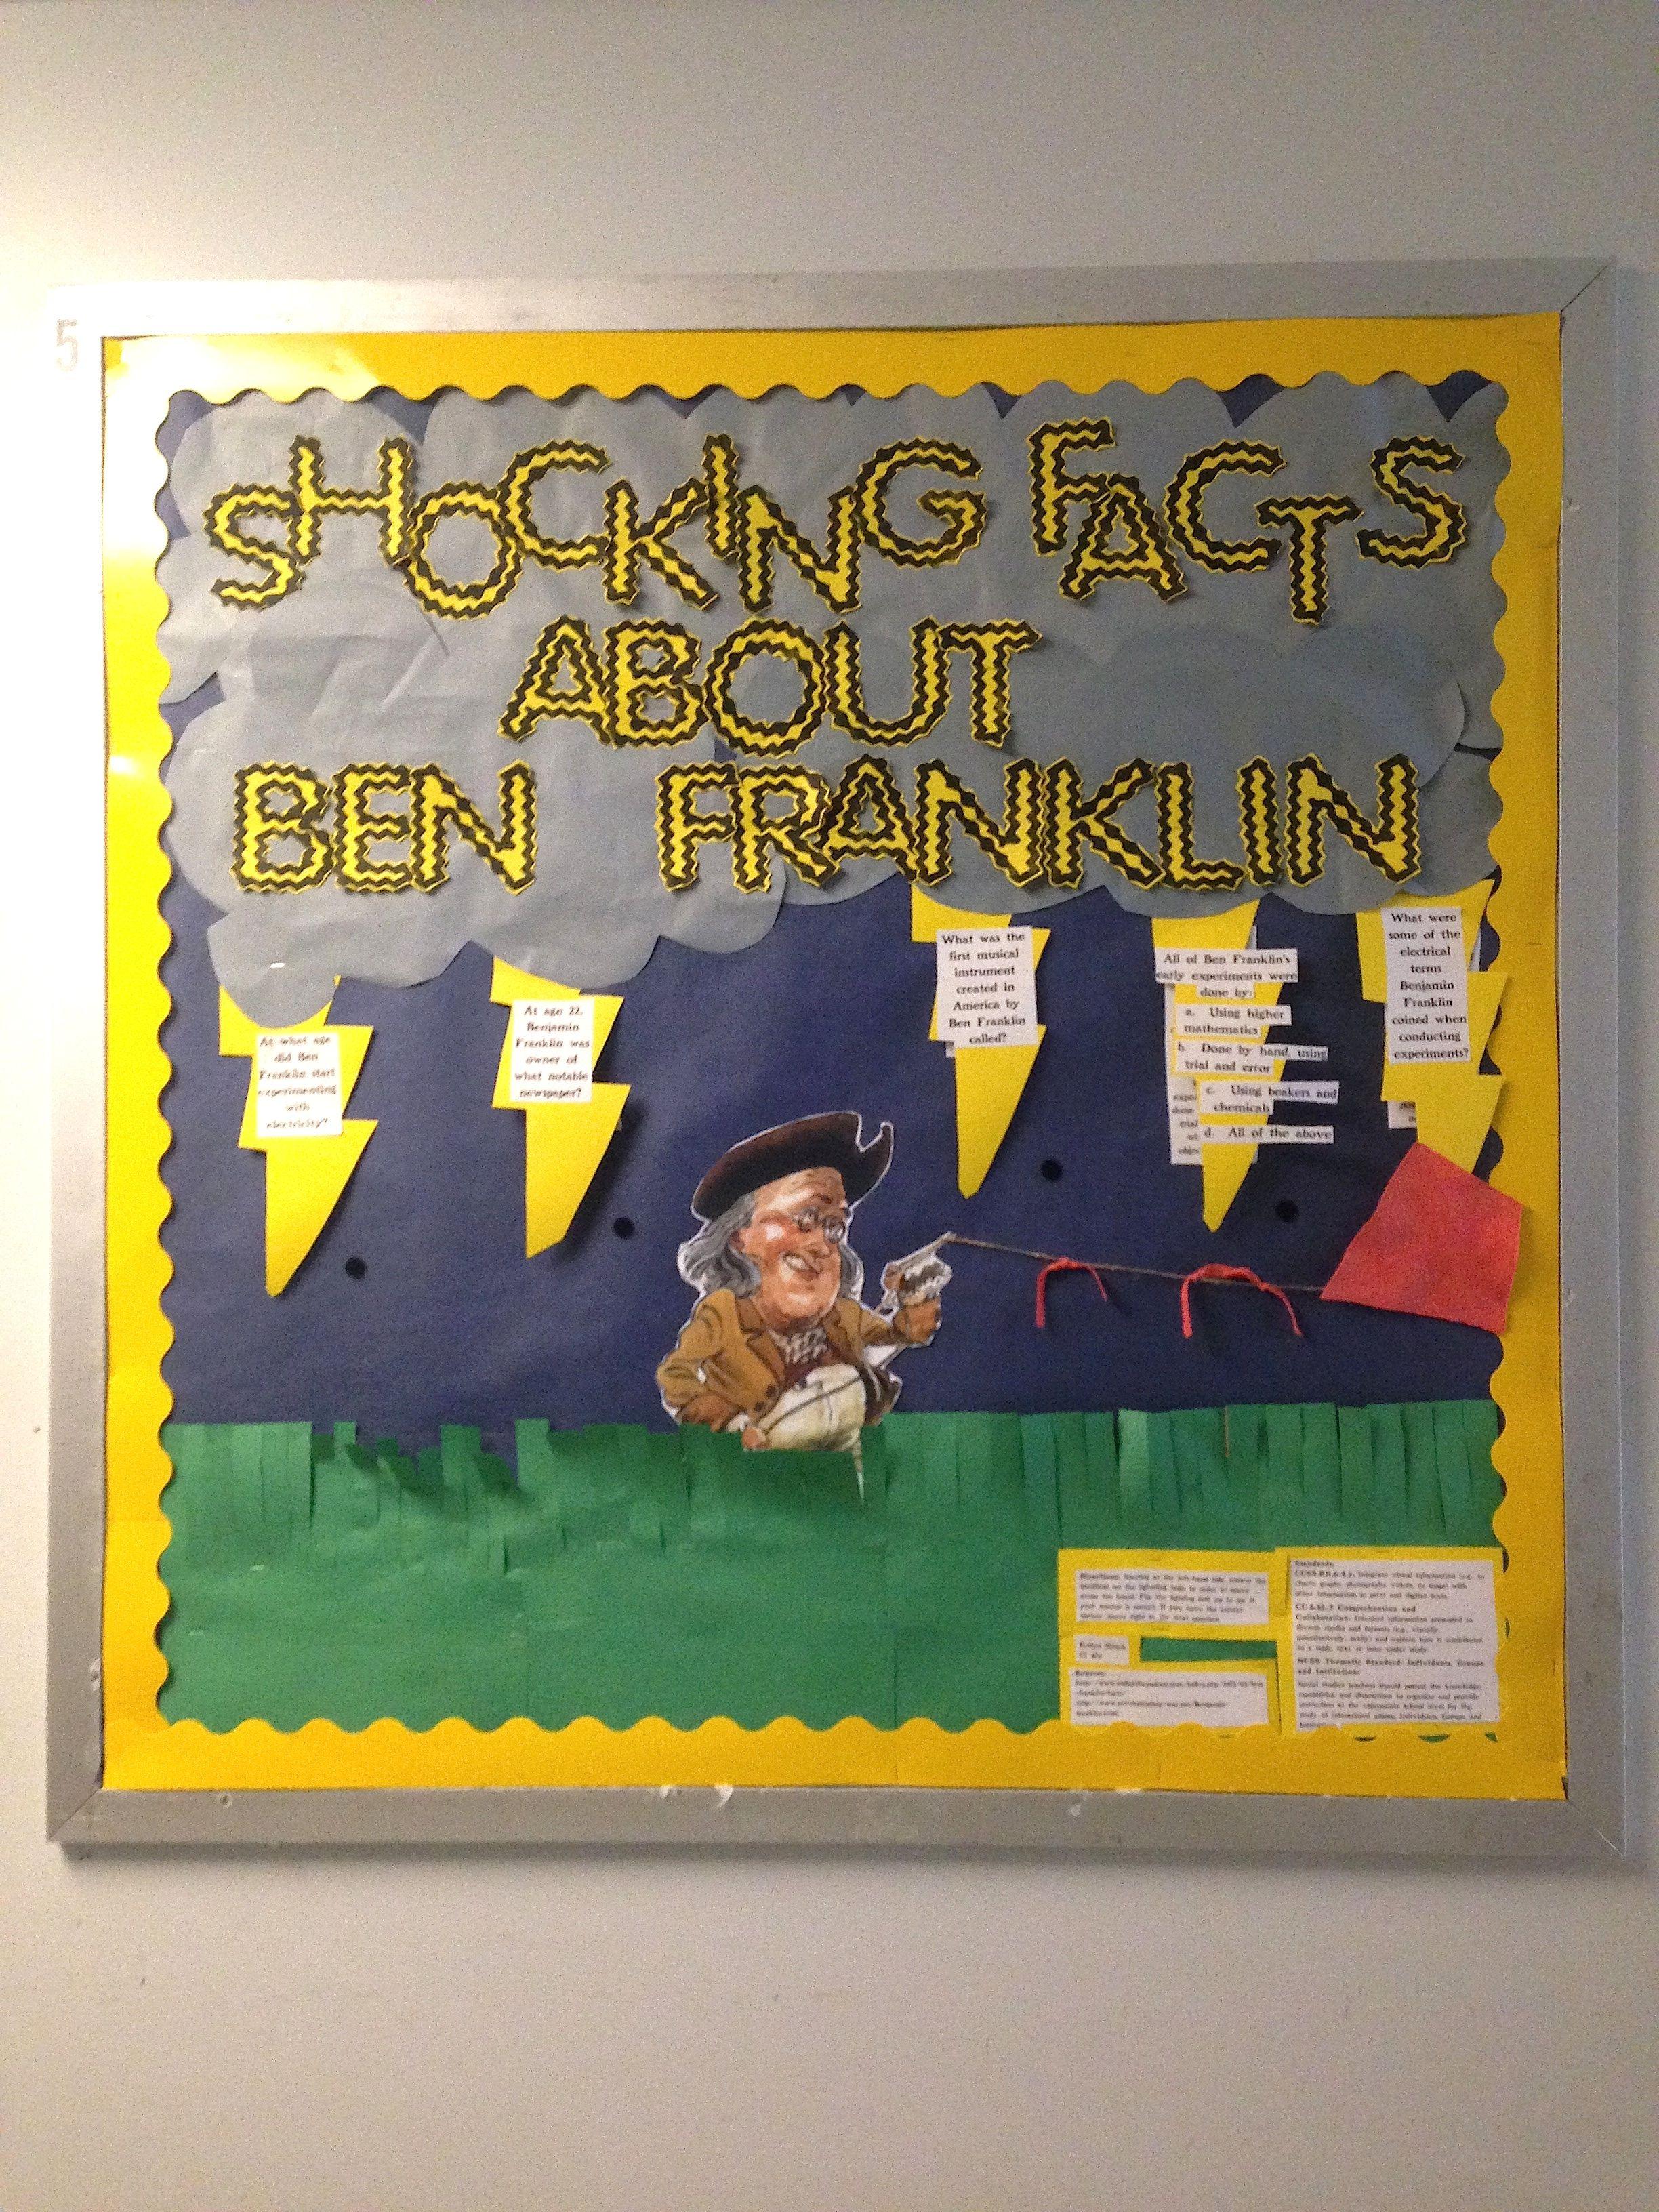 Shocking Facts About Benjamin Franklin Bulletin Board